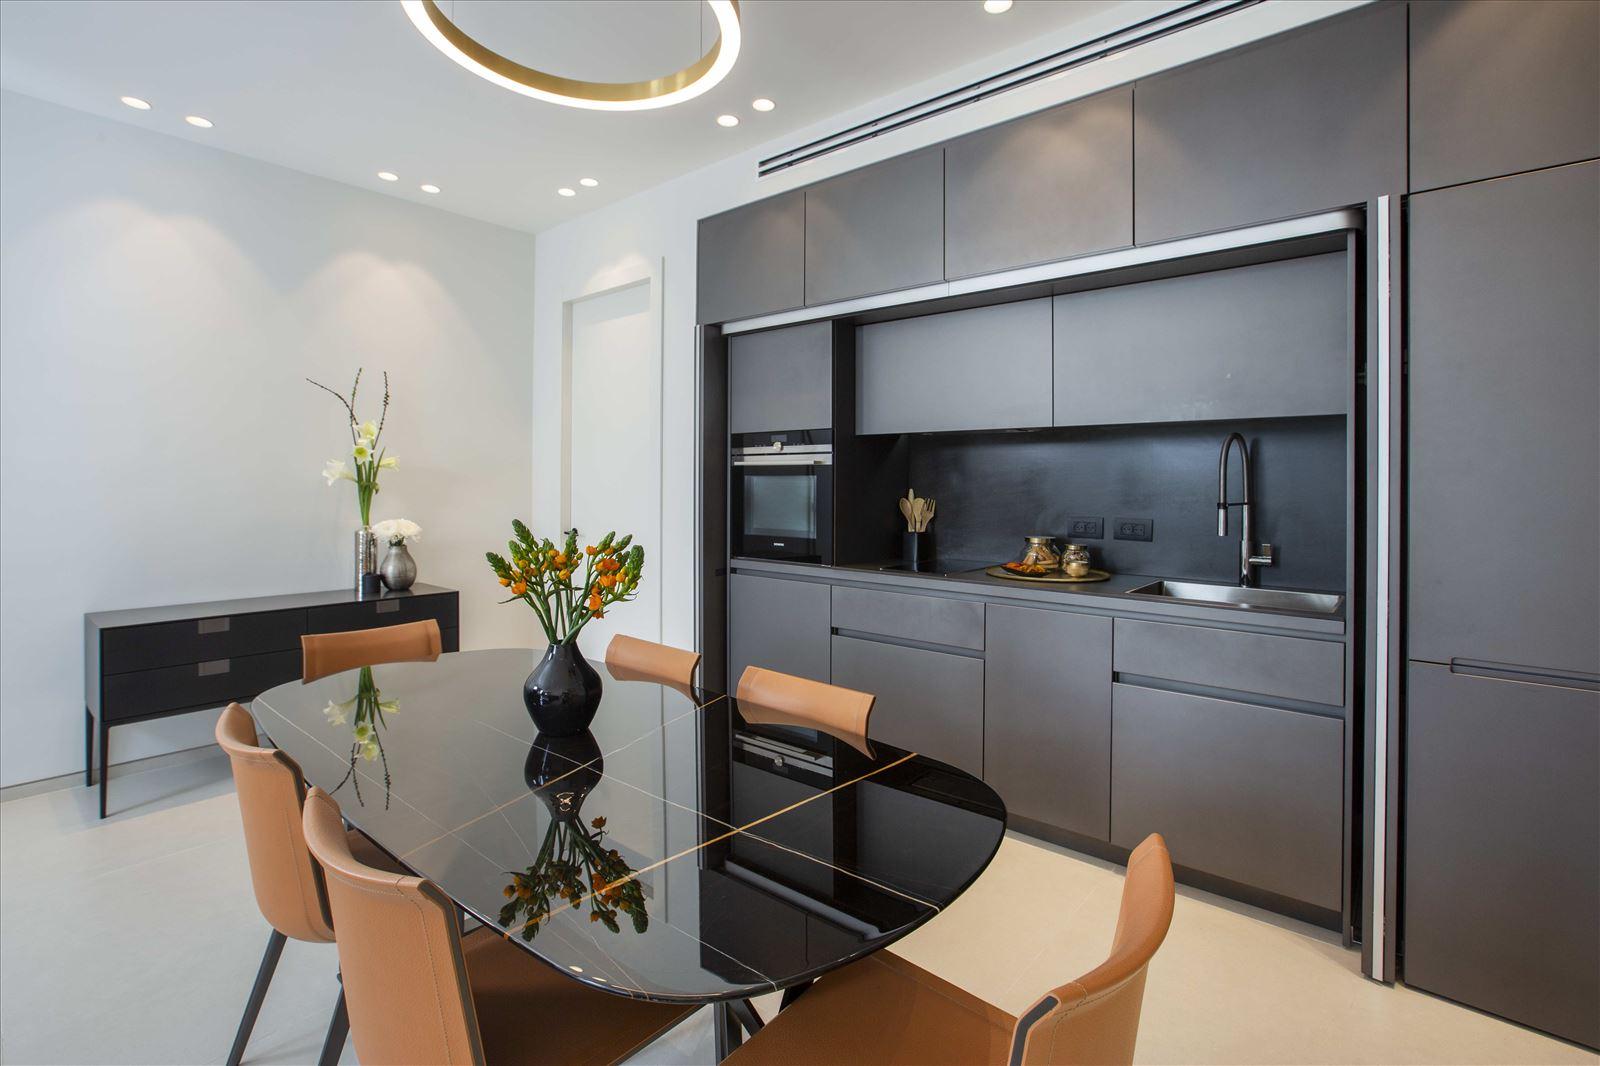 Tel Aviv apartment in Parisian aroma תאורה במטבח מבית קמחי תאורה